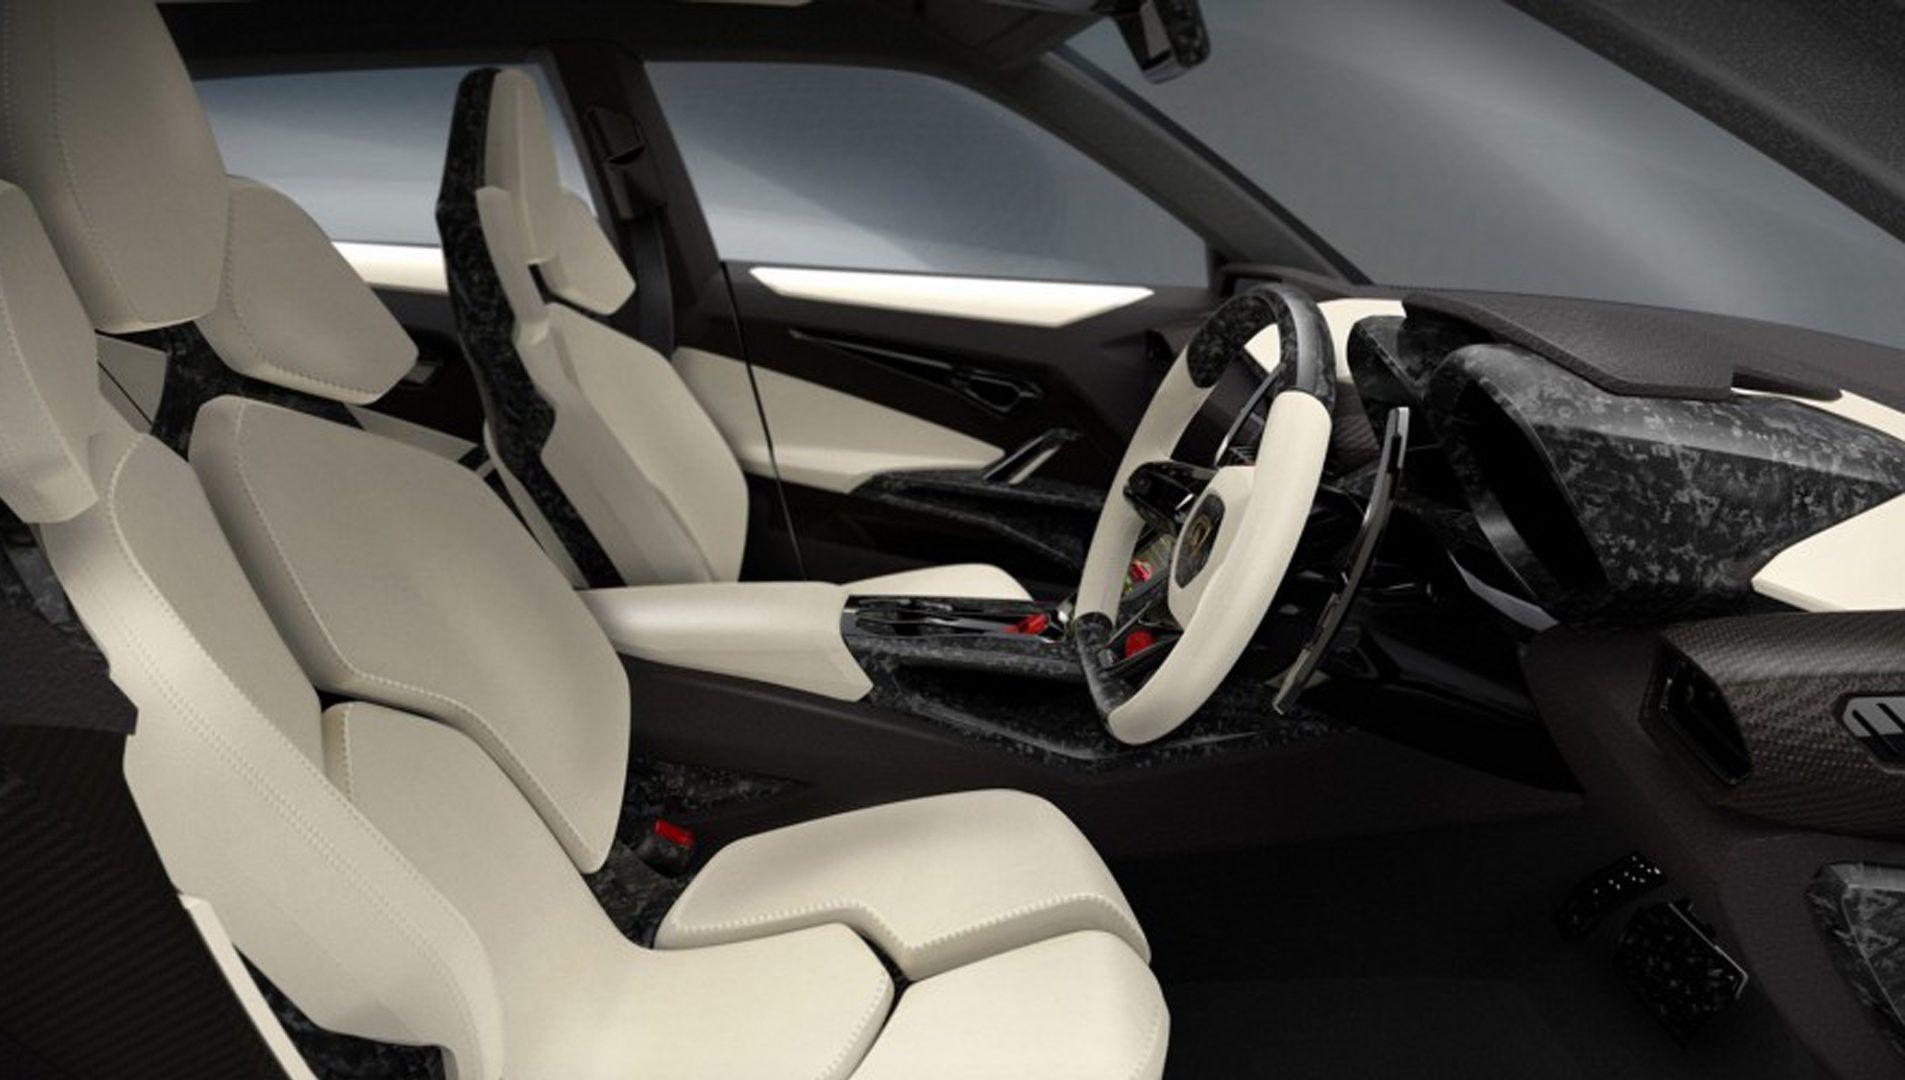 2017 Lamborghini Urus White Interior Mustcars Com Mustcars Com